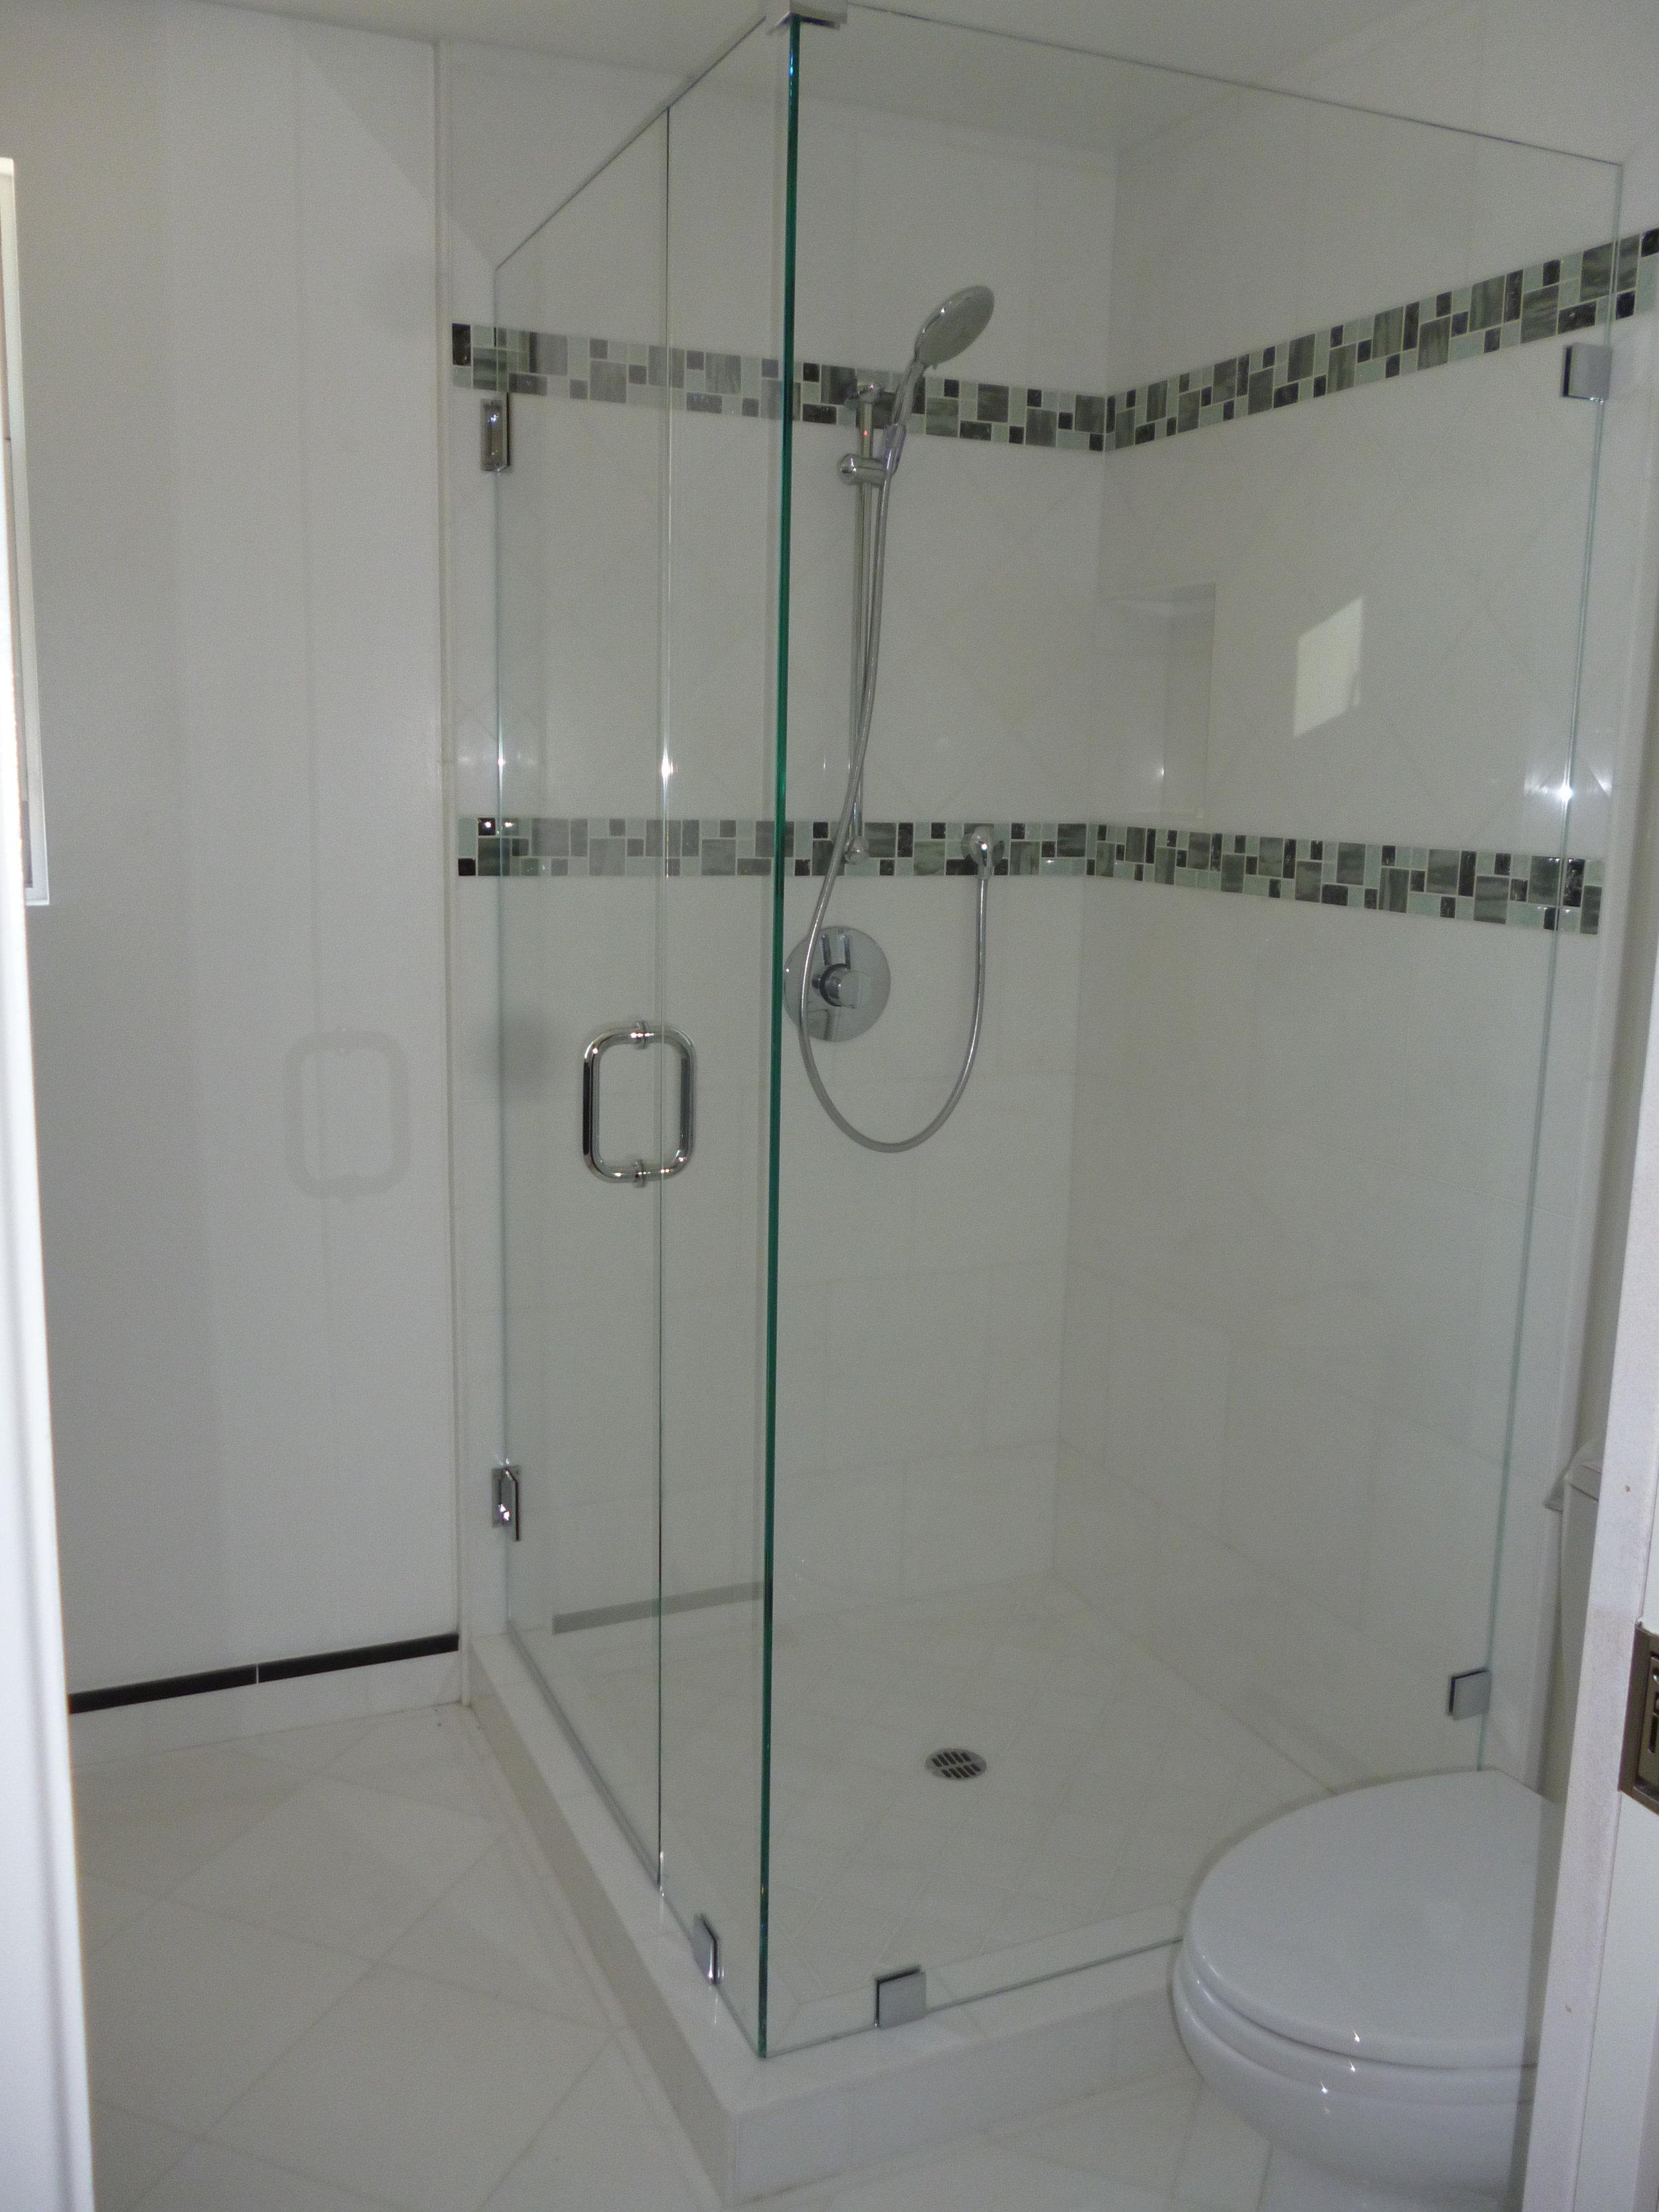 Shower-Doors-Residential-Photos-24.jpg